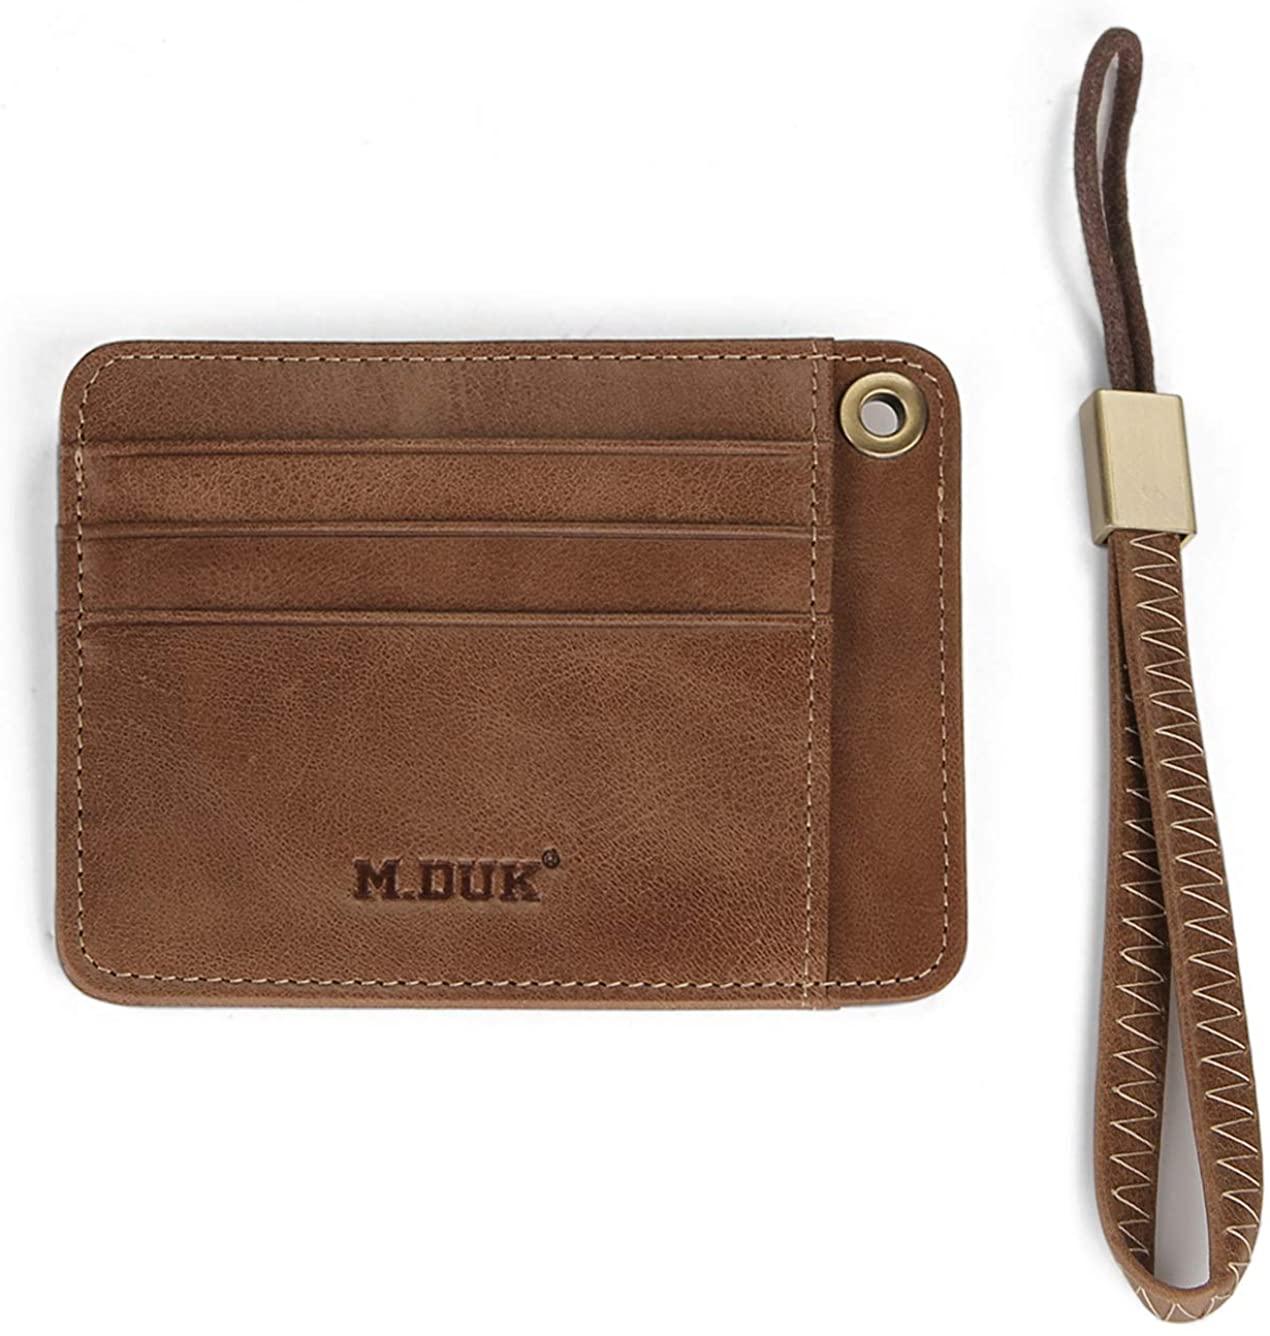 Slim Minimalist Wallet, FIXM Front Pocket Premium-Grade Full Grain Leather Card Holder, Credit Card, ID Card, Driving License Holder for Men & Women (Brown)